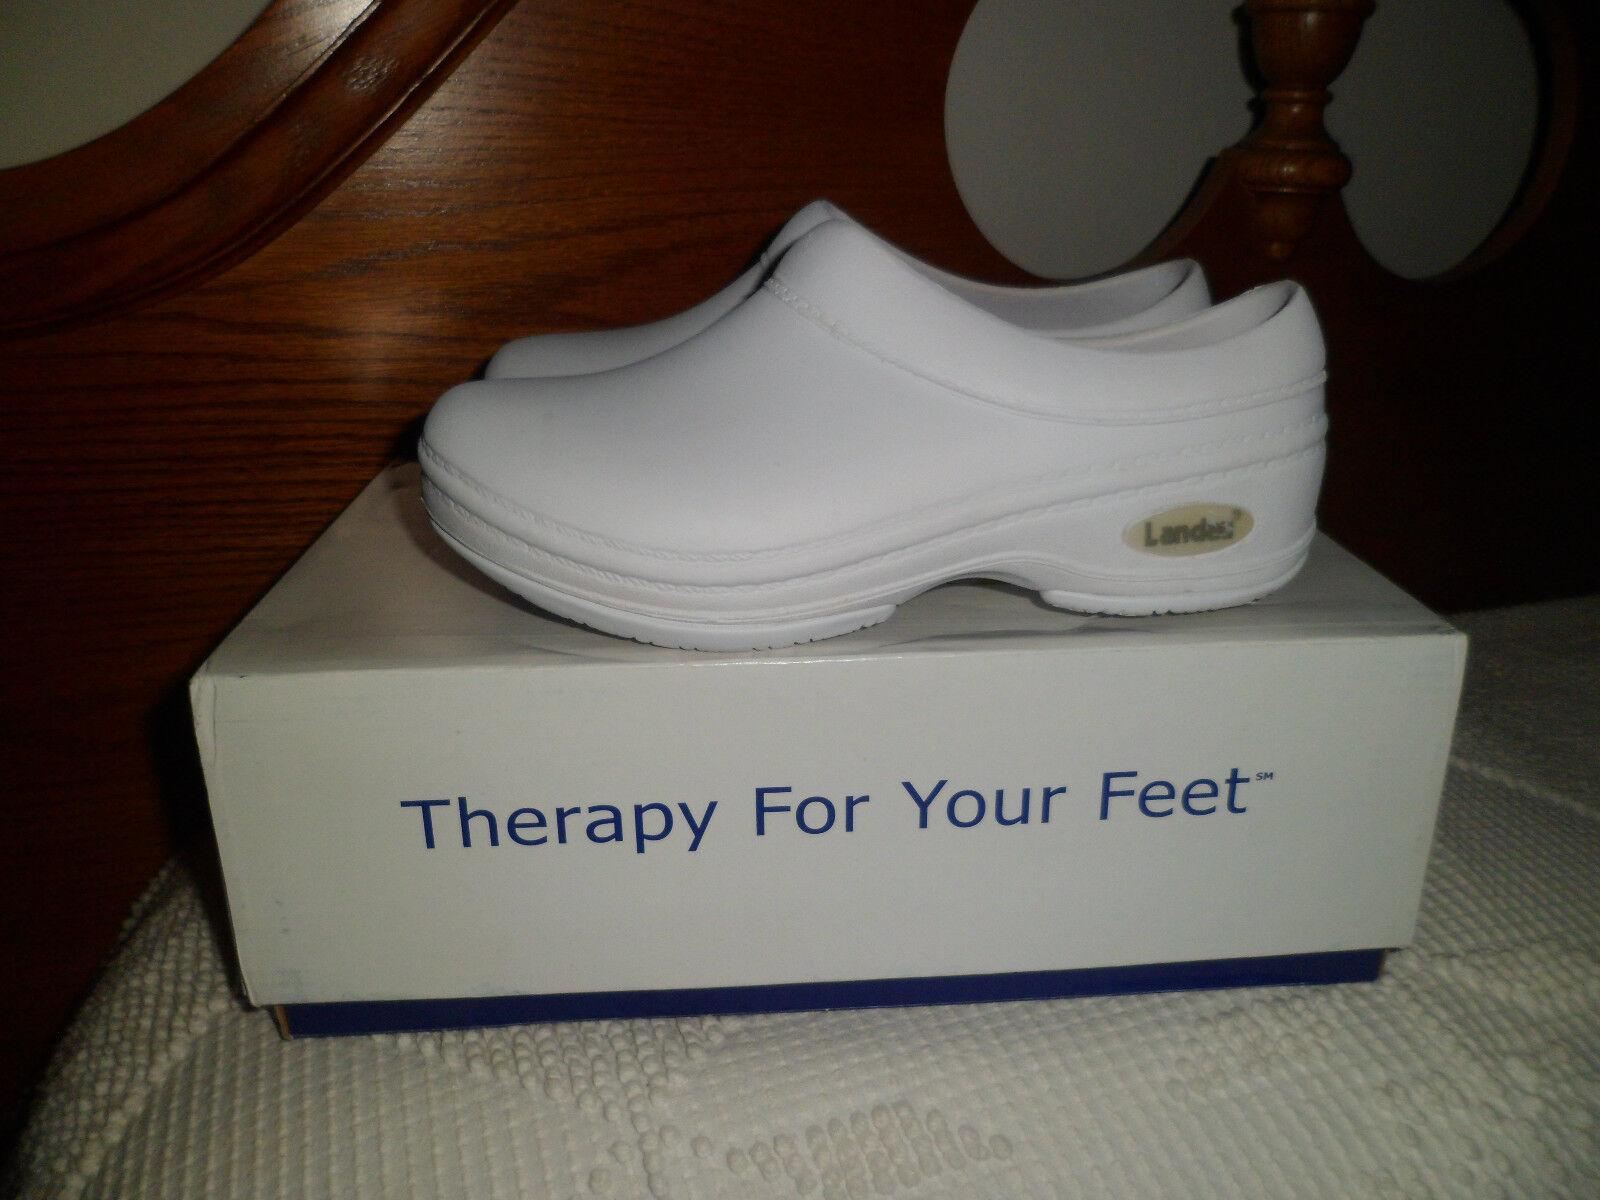 New Landau Weiß FootwearX Nurse Nursing Comfort Weiß Landau Clogs Größe 5 in W Größe 3 in M 199088